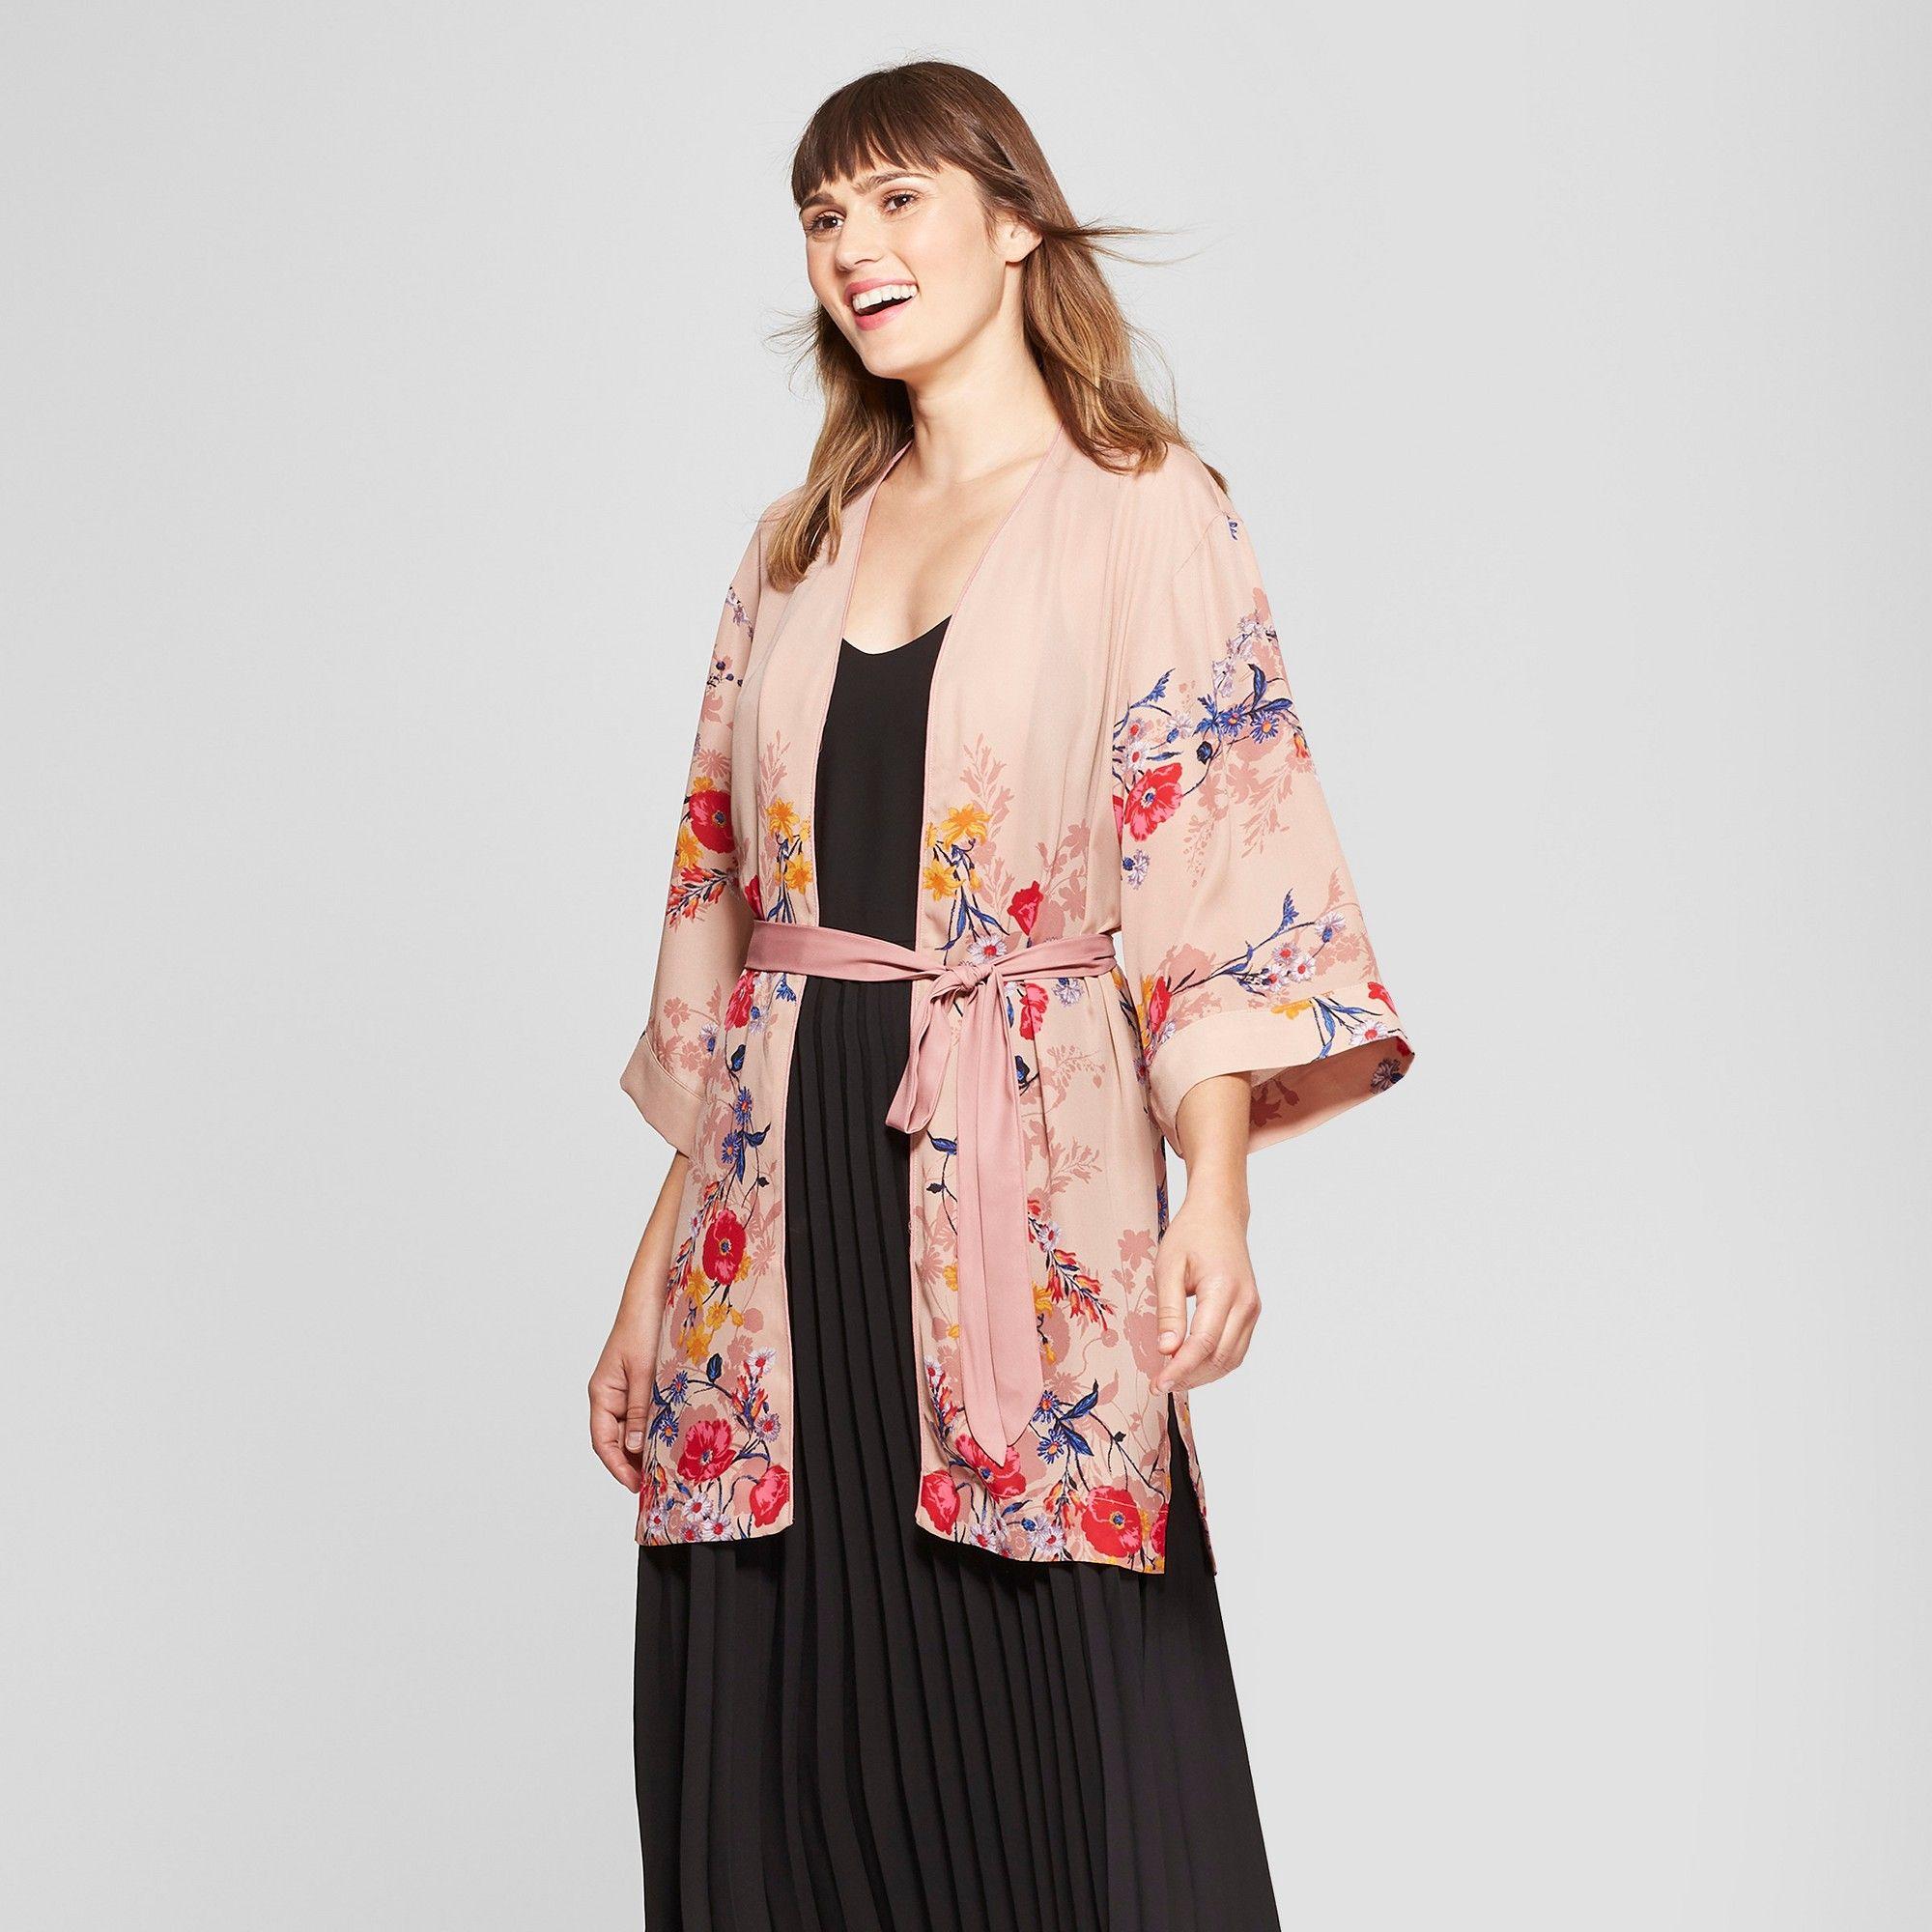 171ab396d61f8 Women's Floral Kimono - A New Day Blush XL/XXL, Pink | Products ...